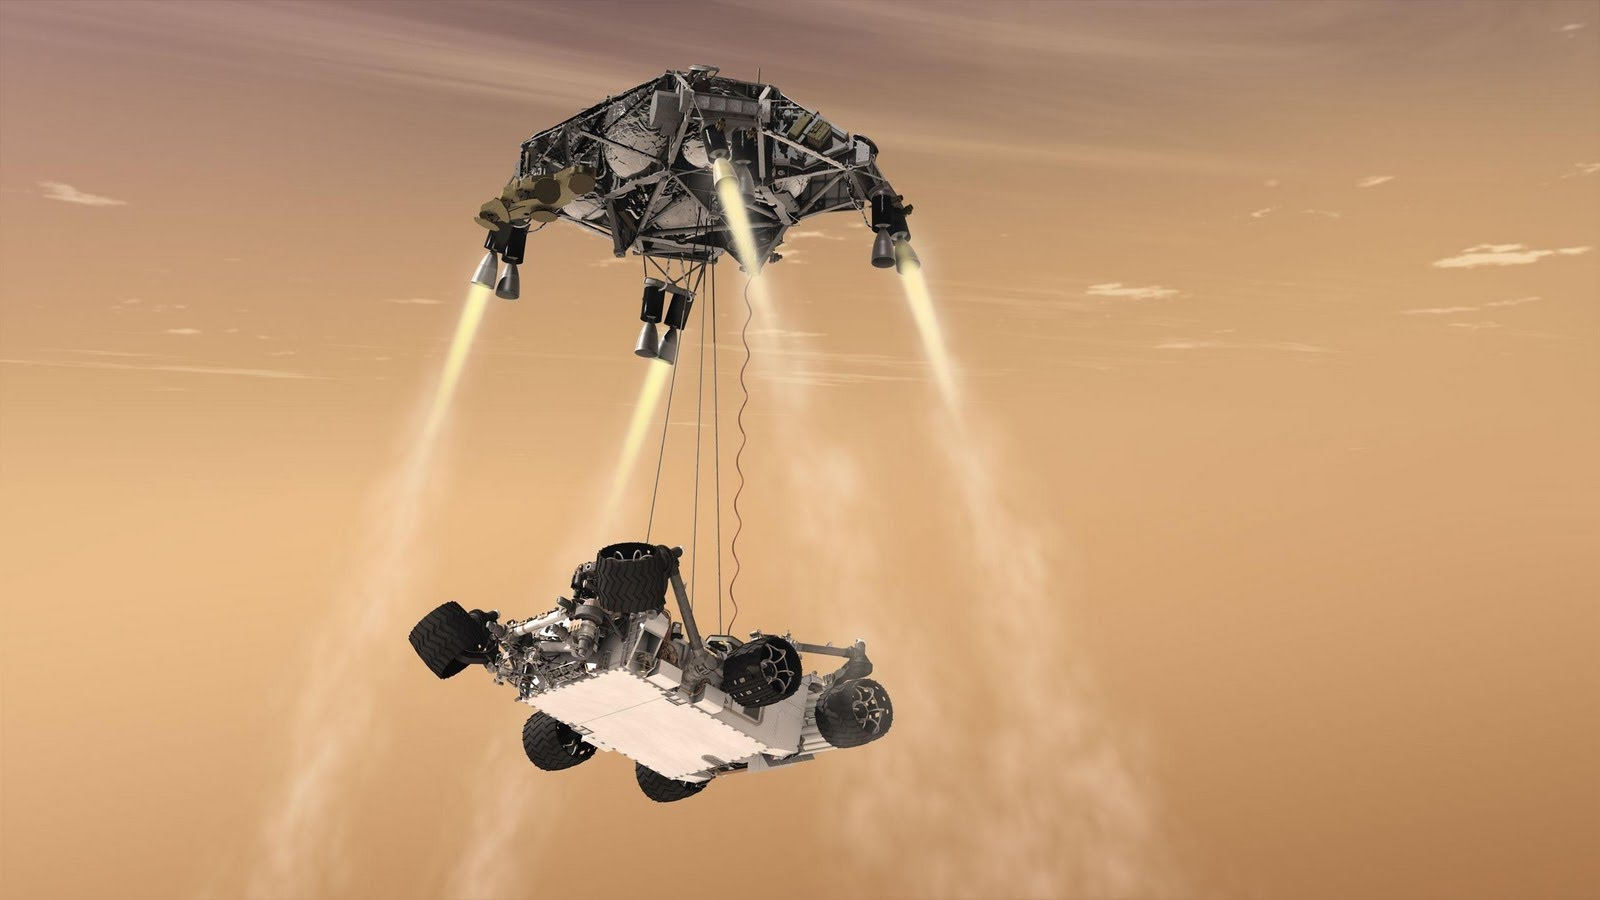 EEVblog #328 – Curiosity Mars Rover Landing